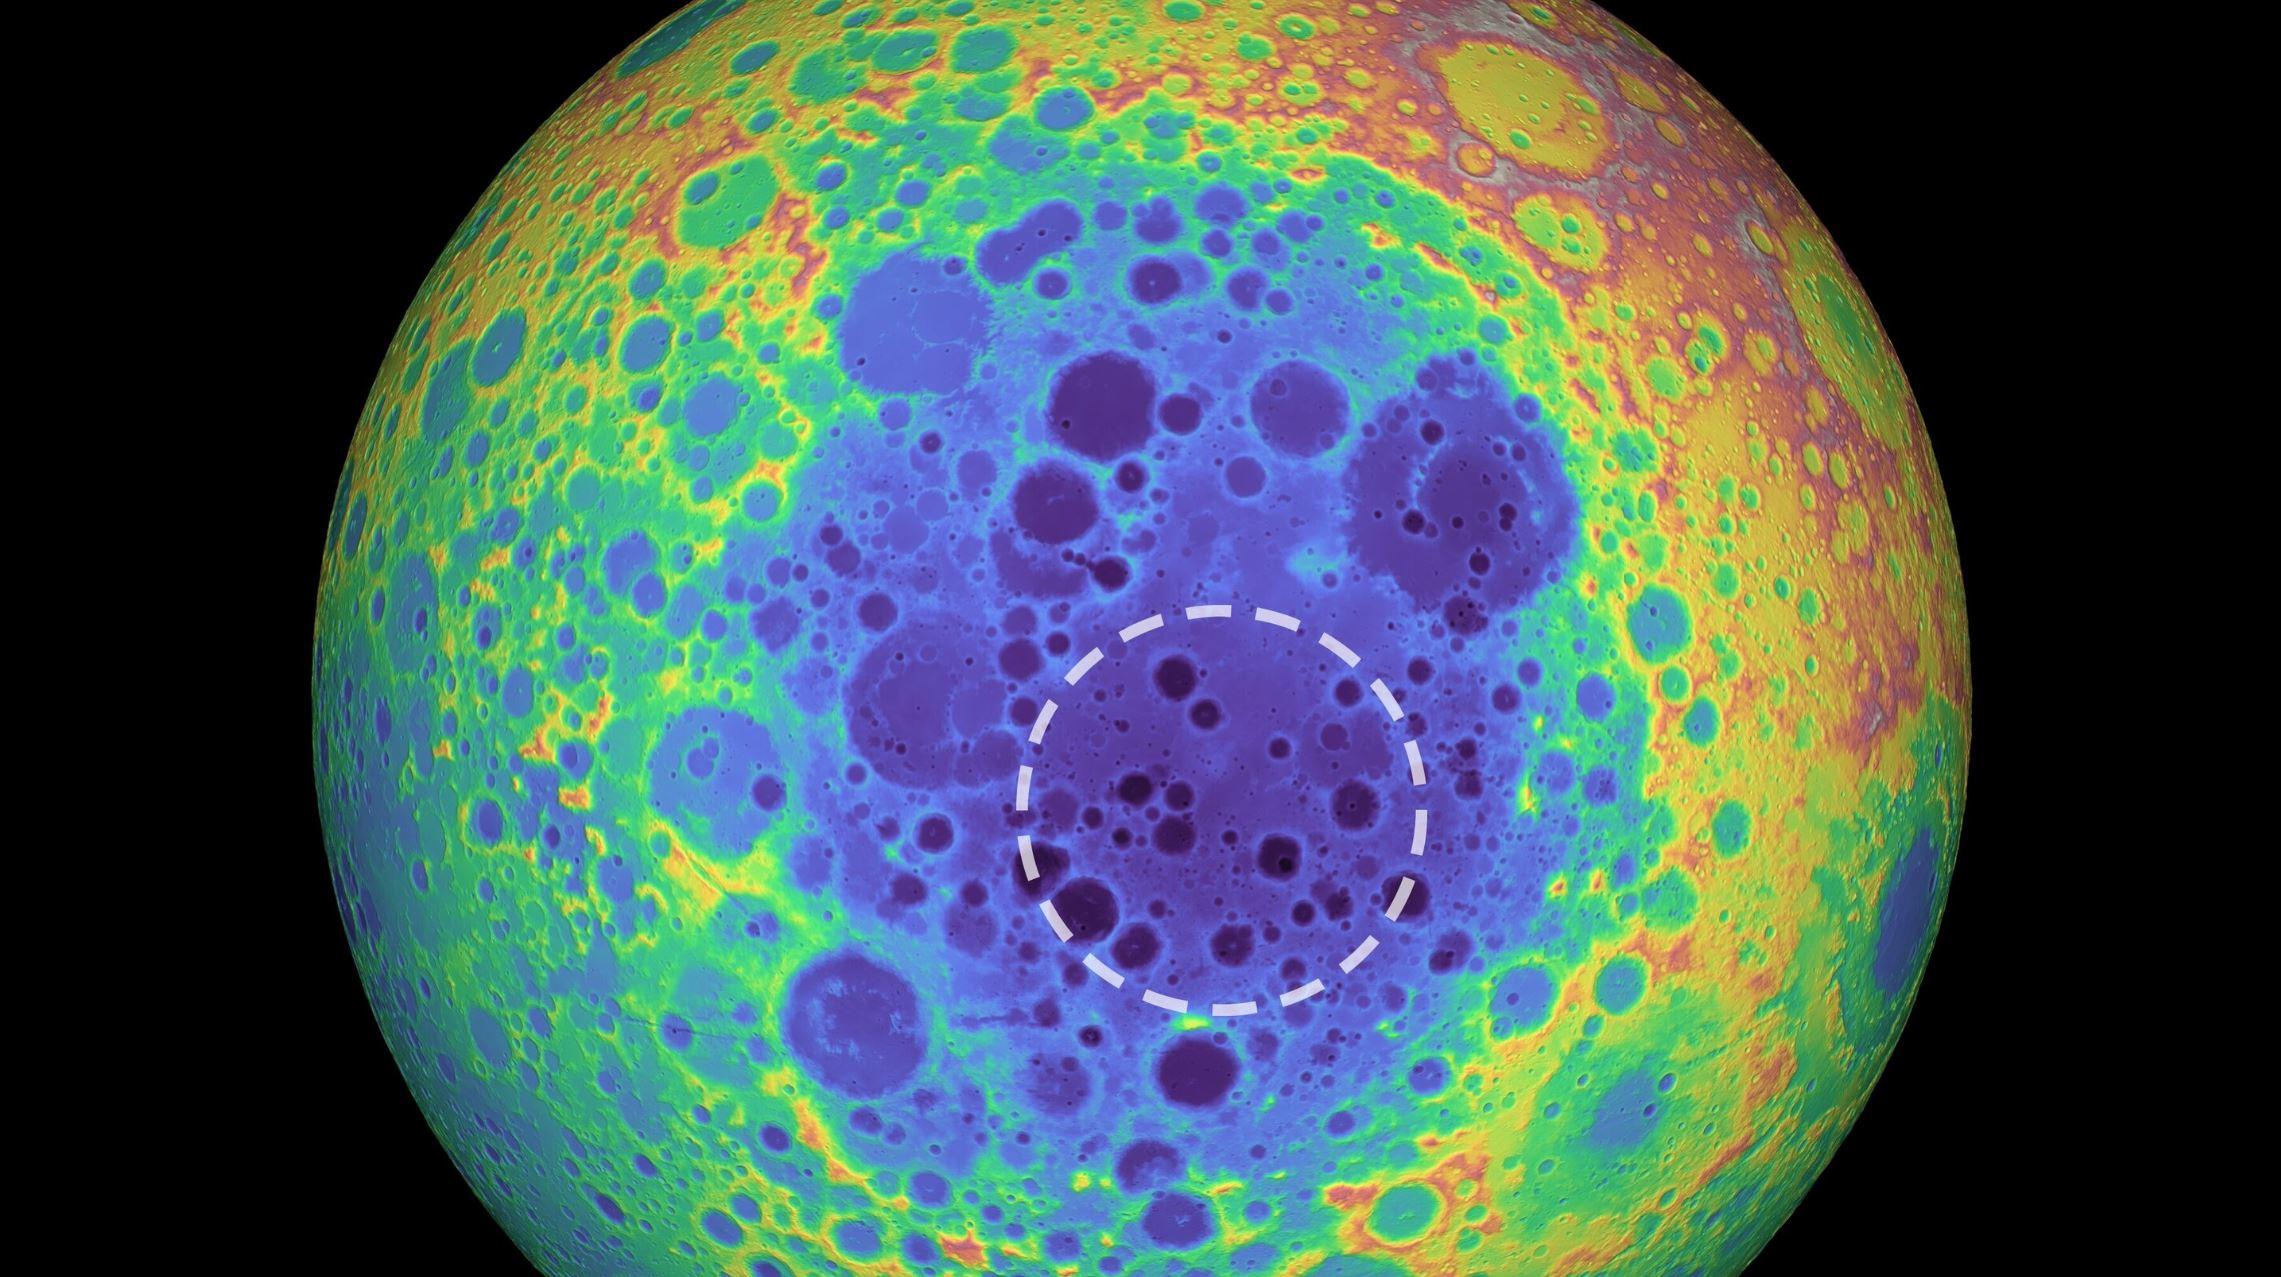 Image Credits: NASA/Goddard Space Flight Center/University of Arizona